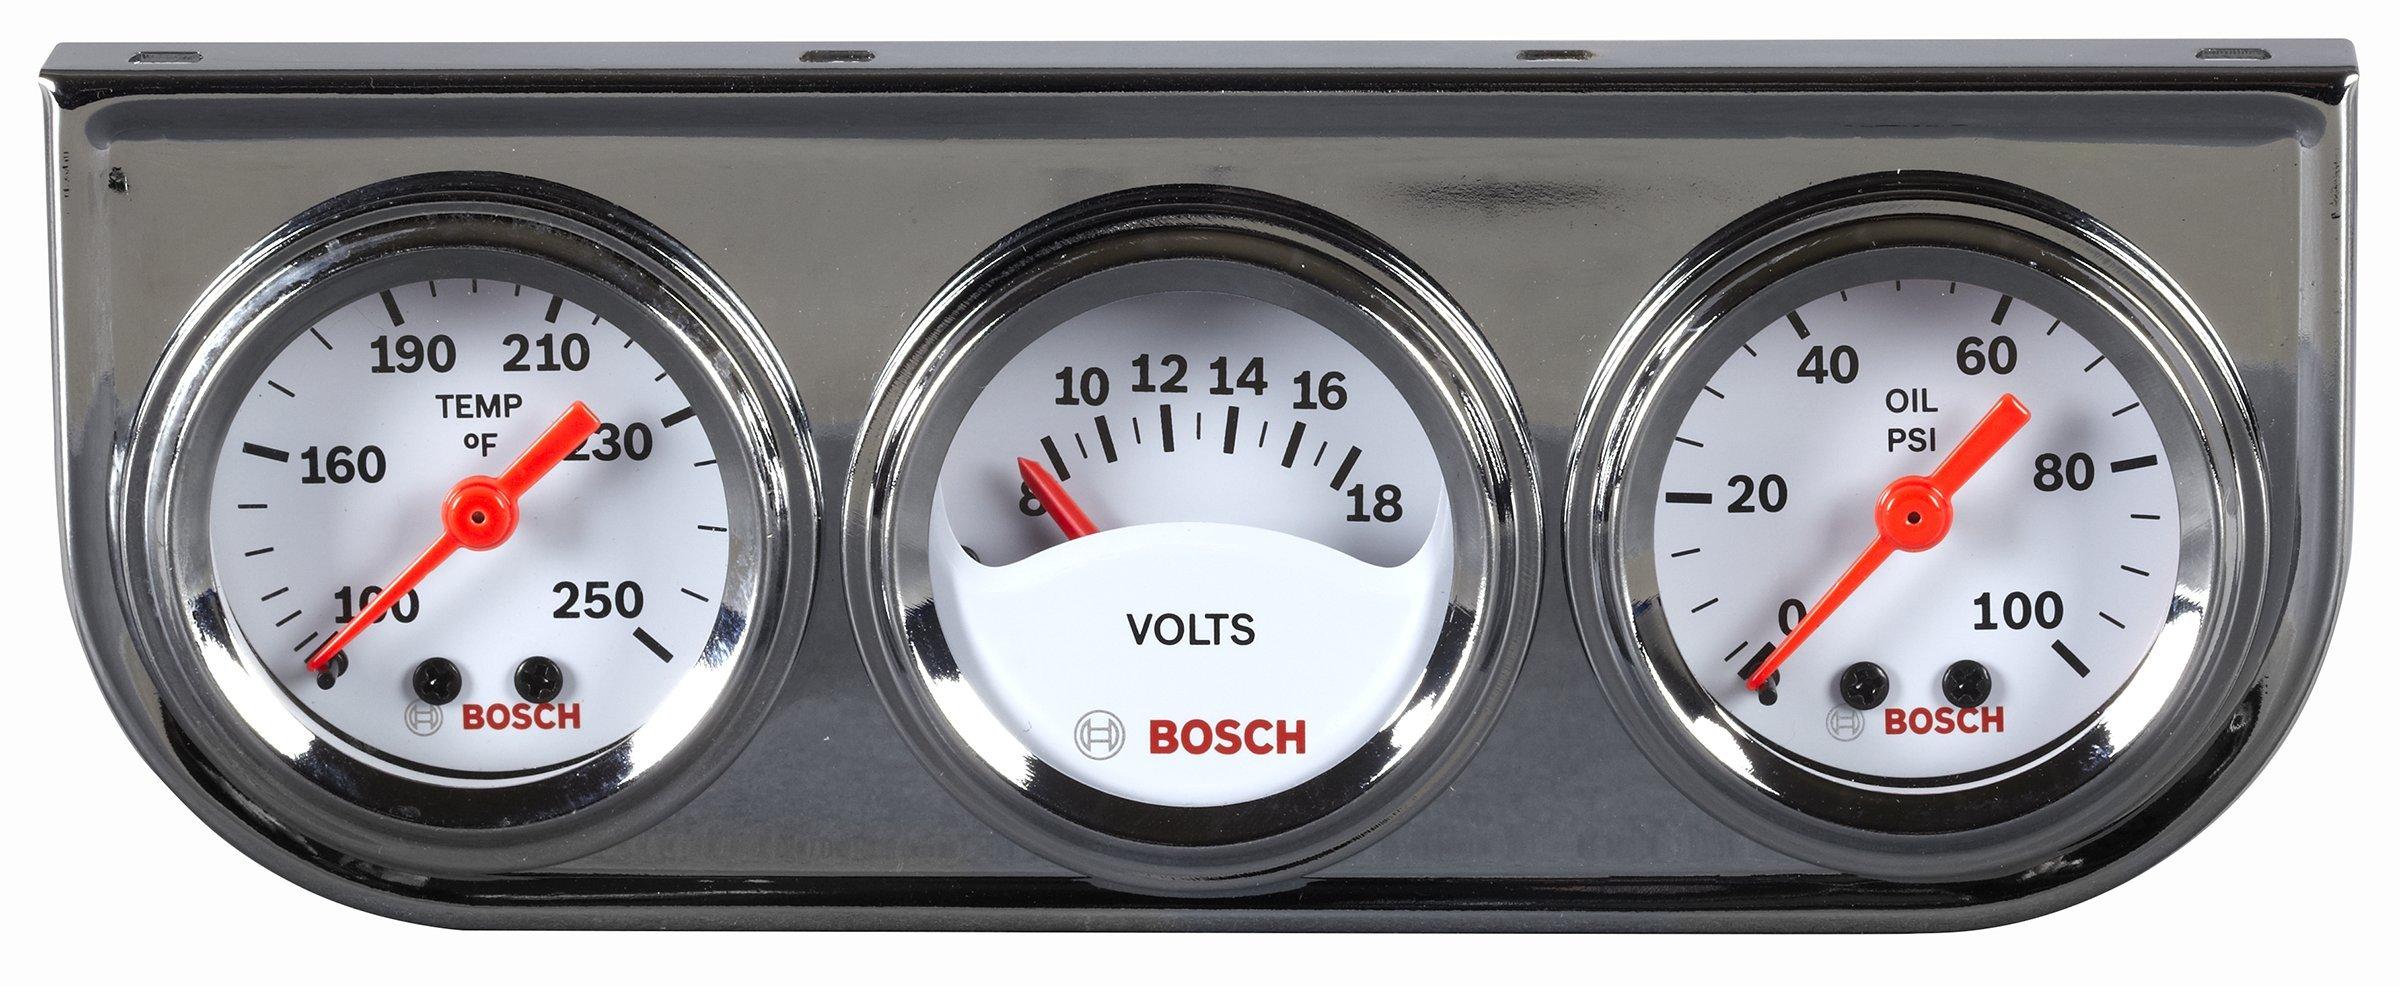 Bosch SP0F000039 Style Line 1-1/2'' Mini Triple Gauge Kit (White Dial Face, Chrome Bezel) by Bosch Automotive